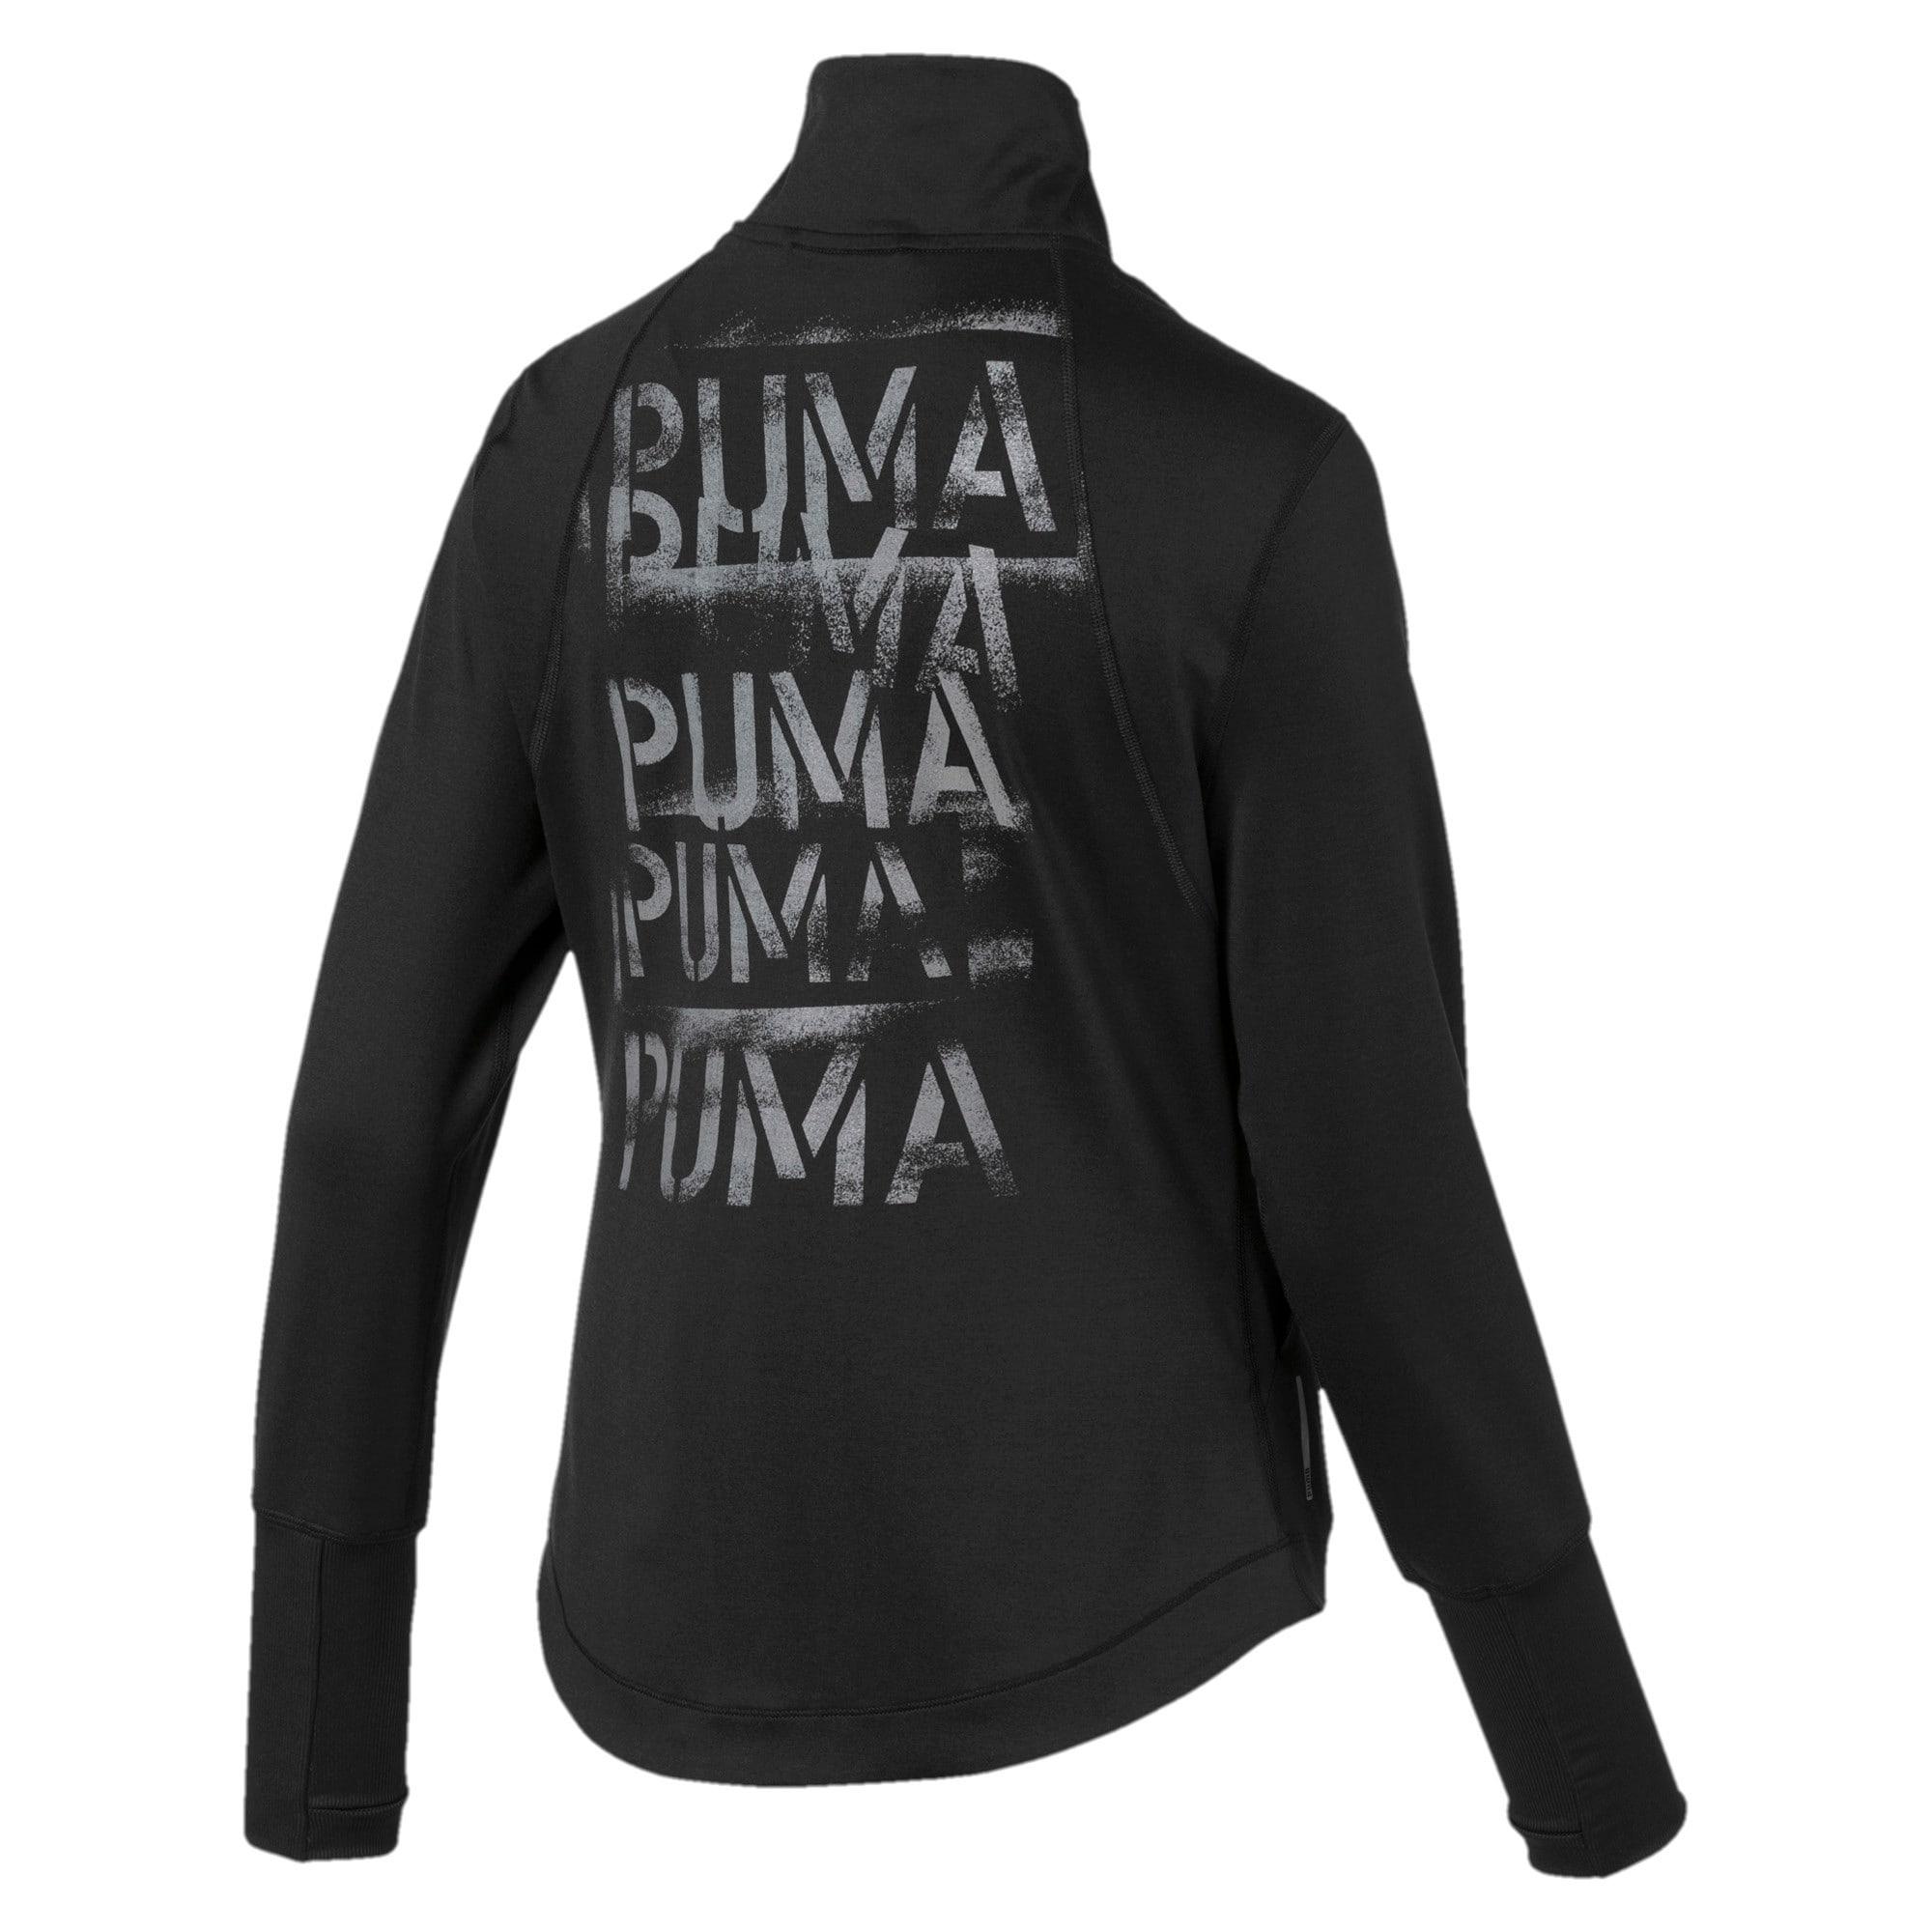 Thumbnail 5 of Studio Knit Women's Training Jacket, Puma Black, medium-IND